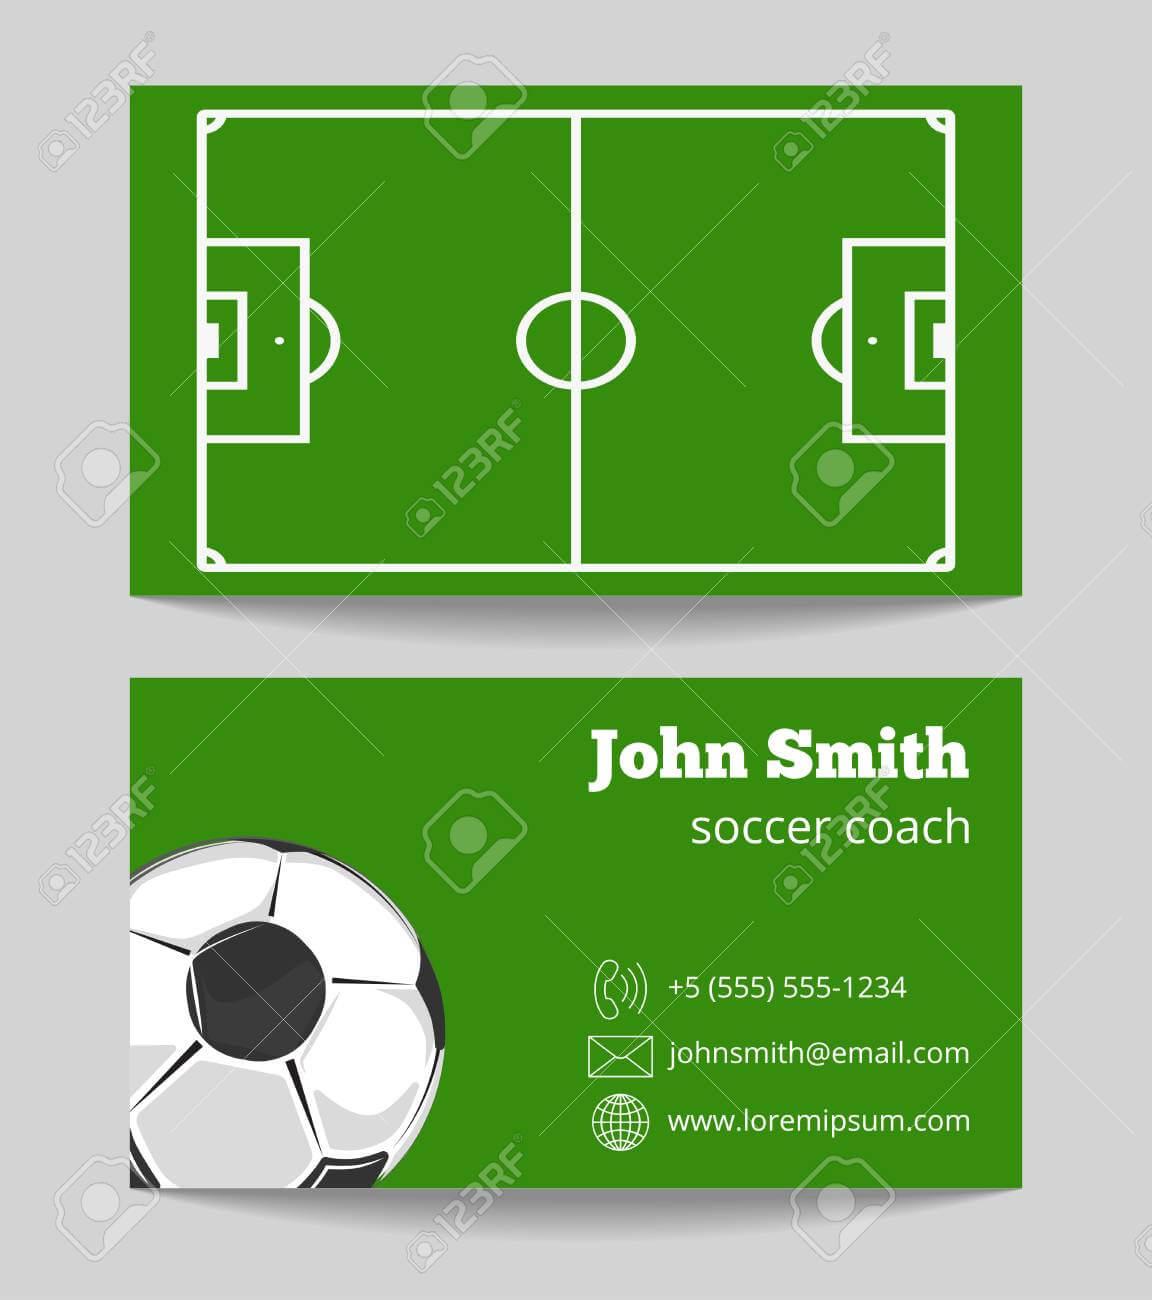 Soccer Green Field Business Card Template. Football Field On.. Regarding Soccer Referee Game Card Template